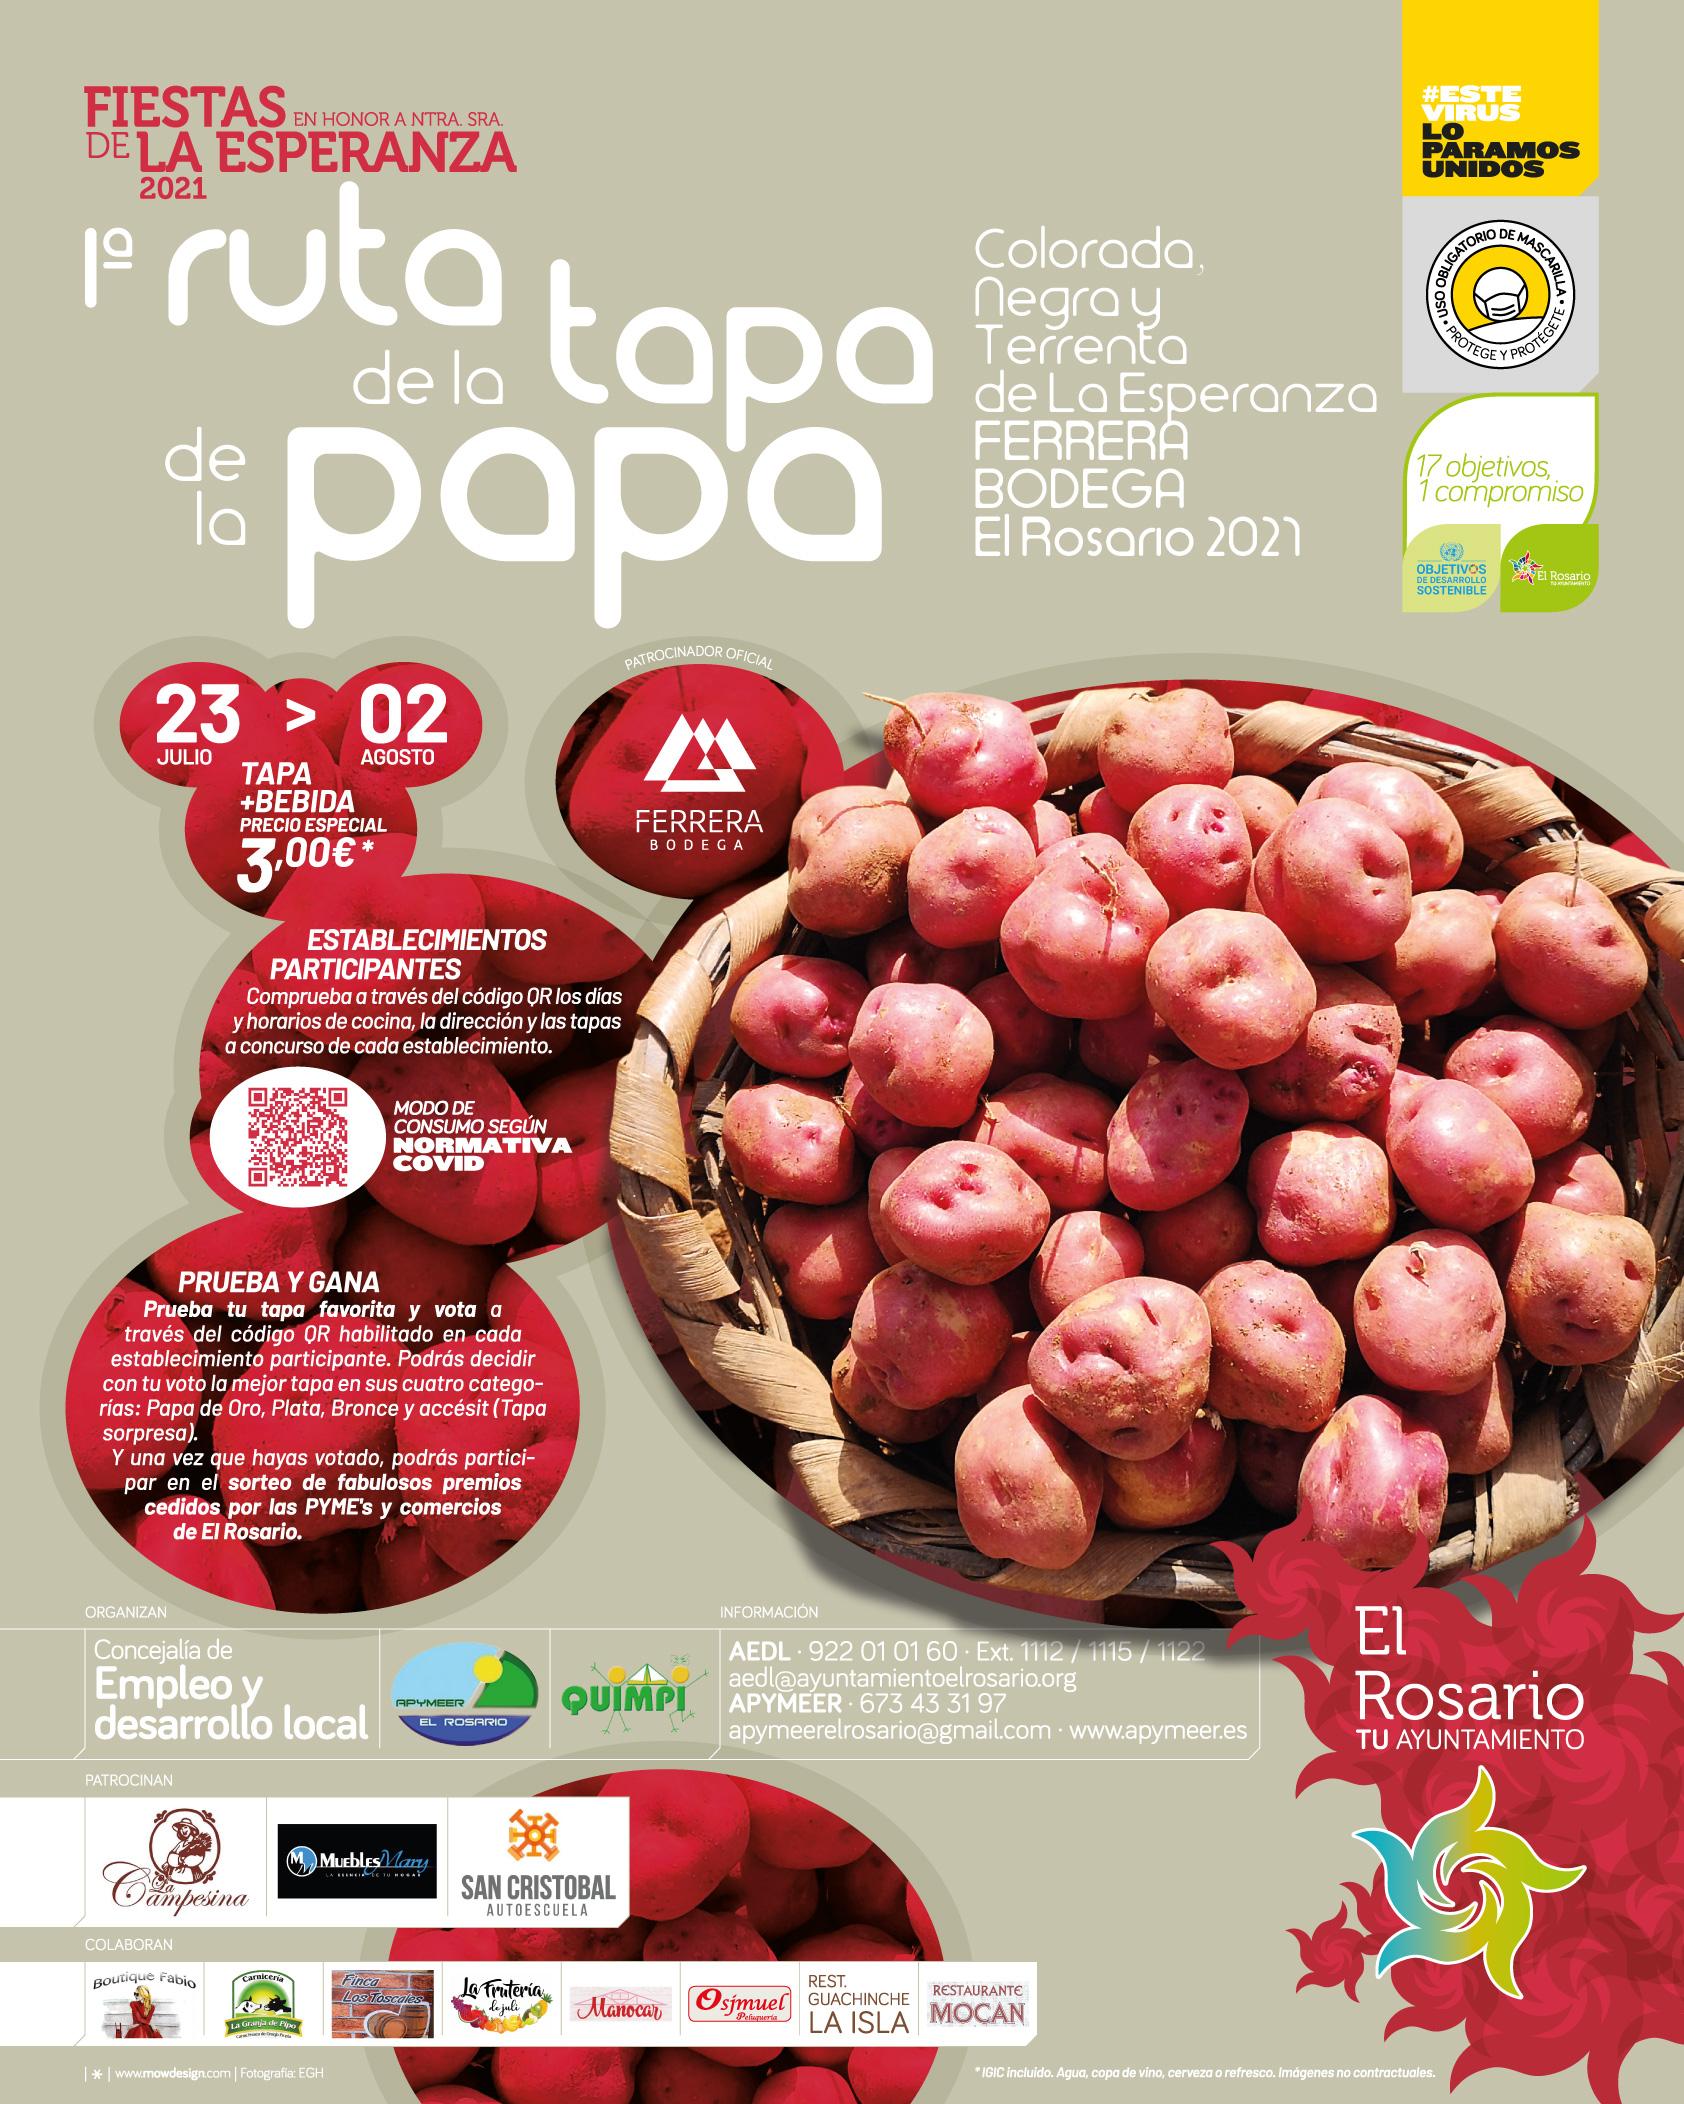 I_RUTA_TAPA_PAPA-20210723-CARTEL_A3-20210716-03af-redes